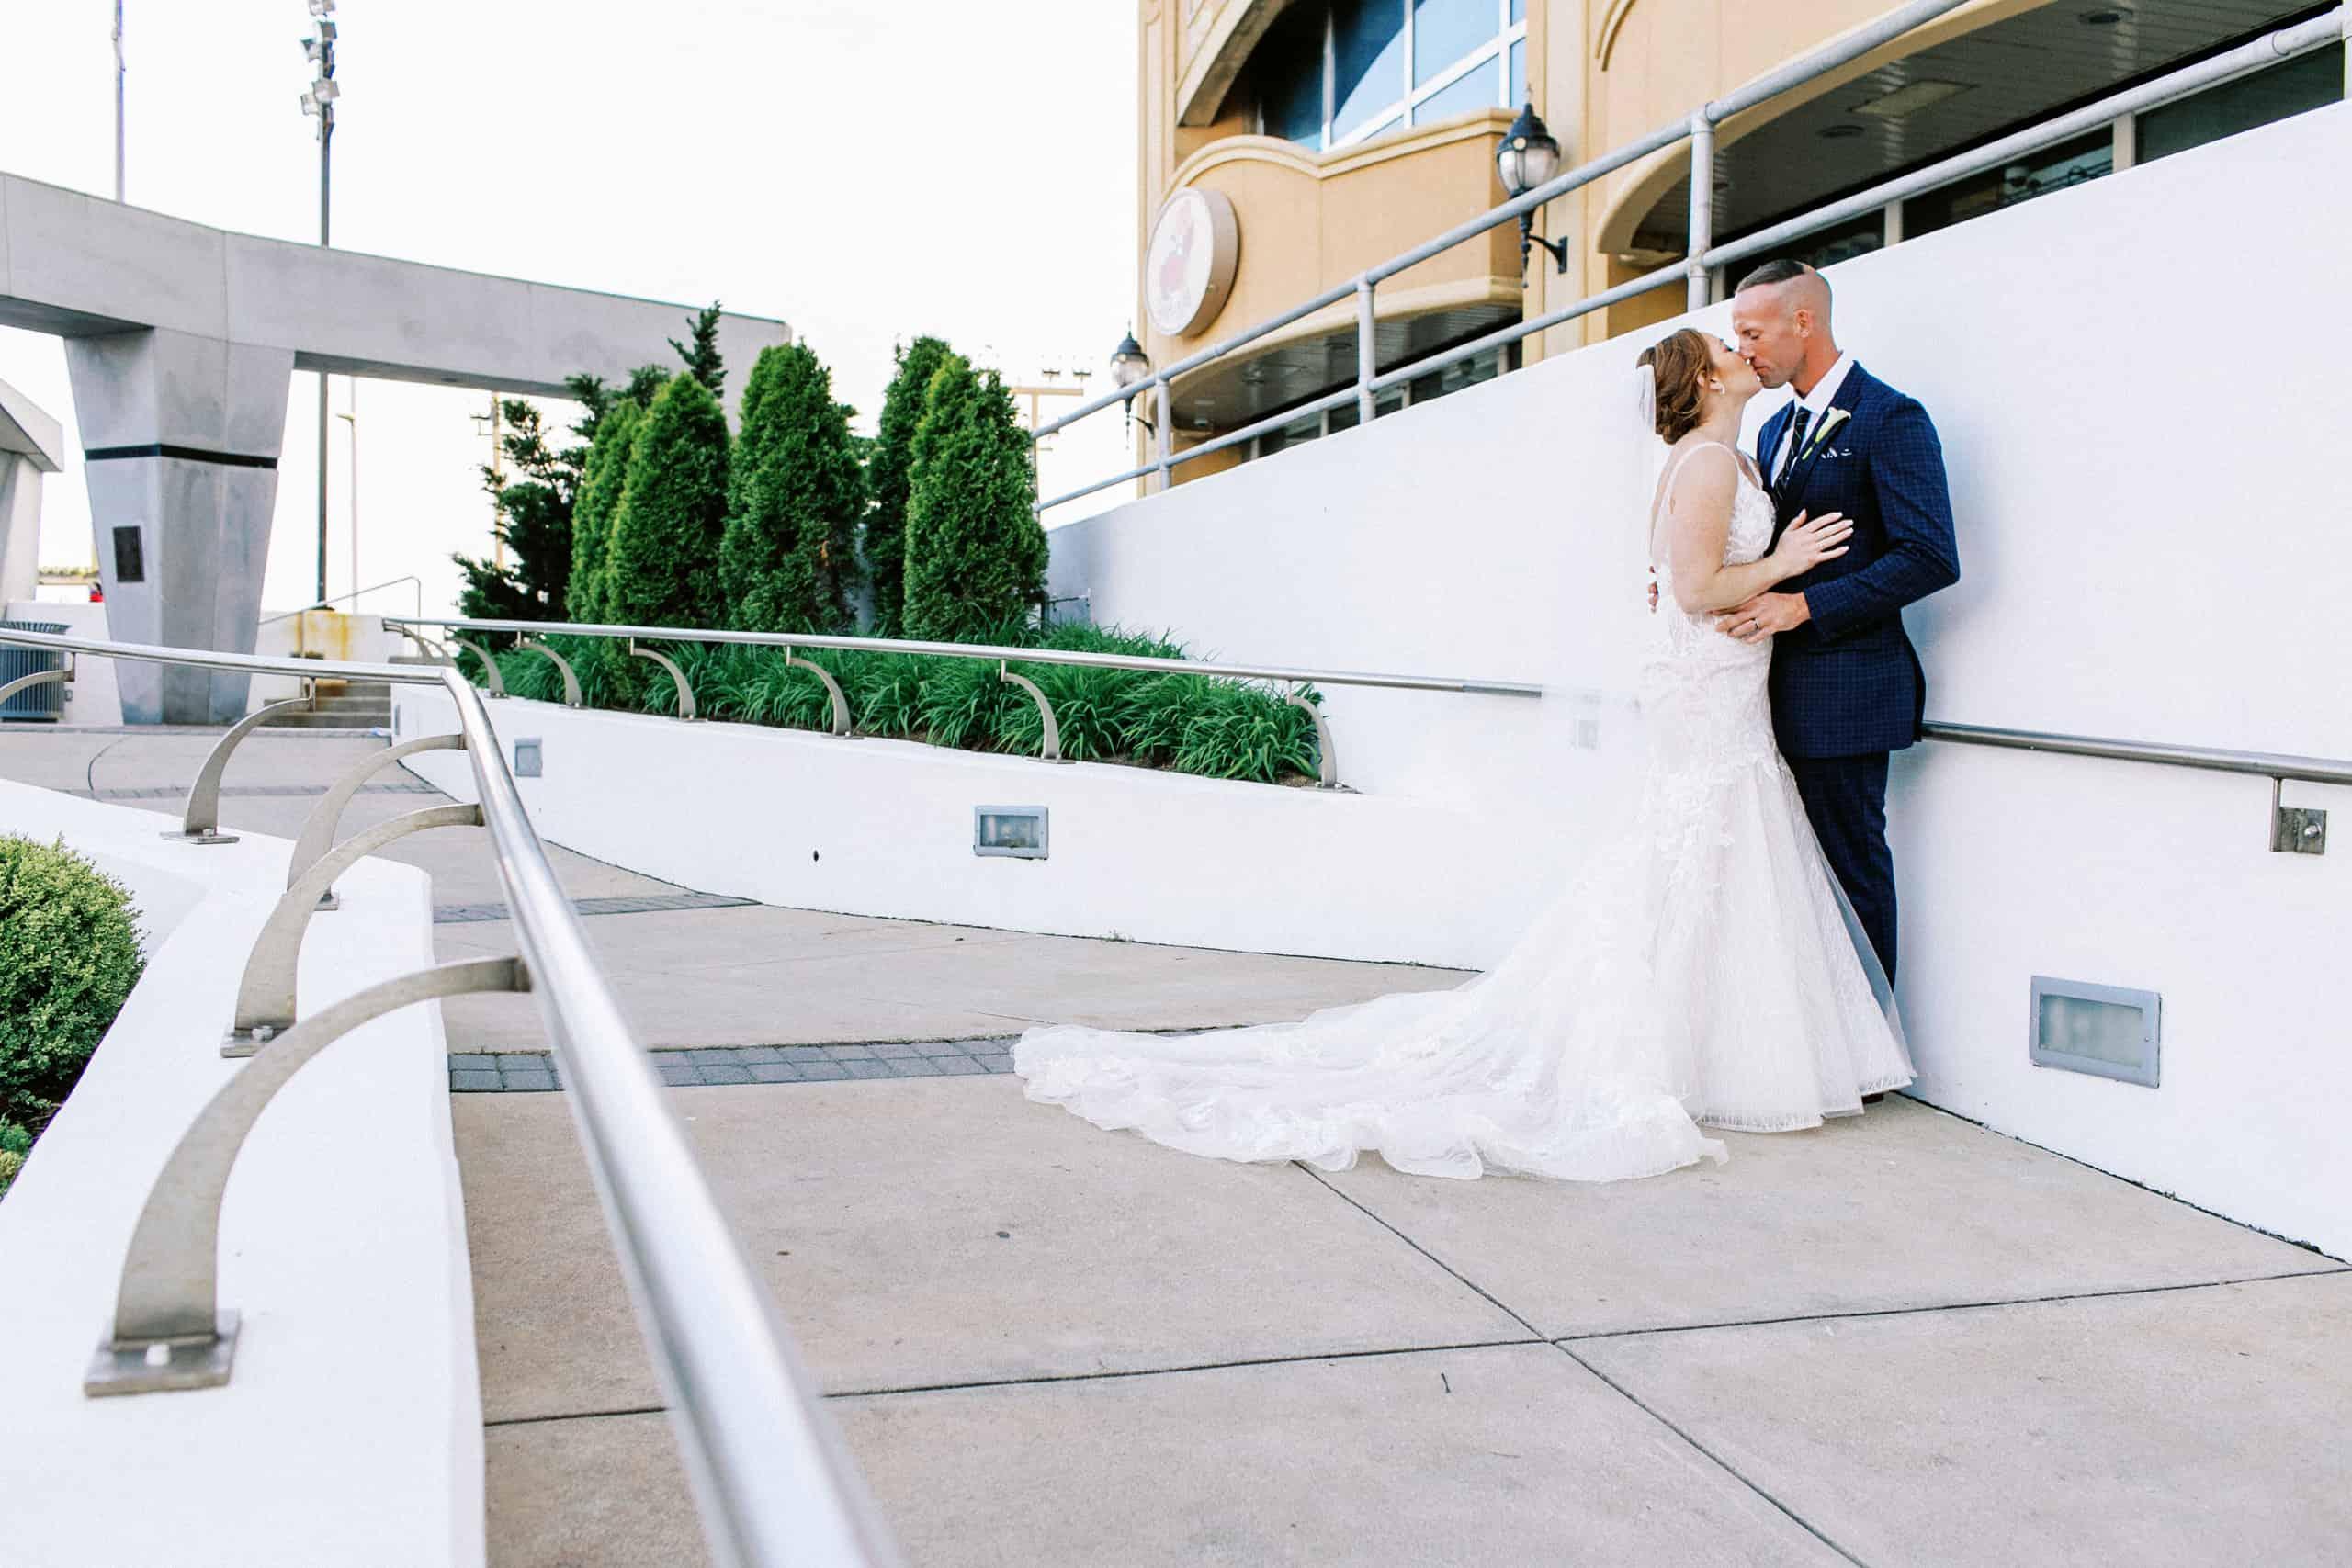 Atlantic City Boardwalk weddings